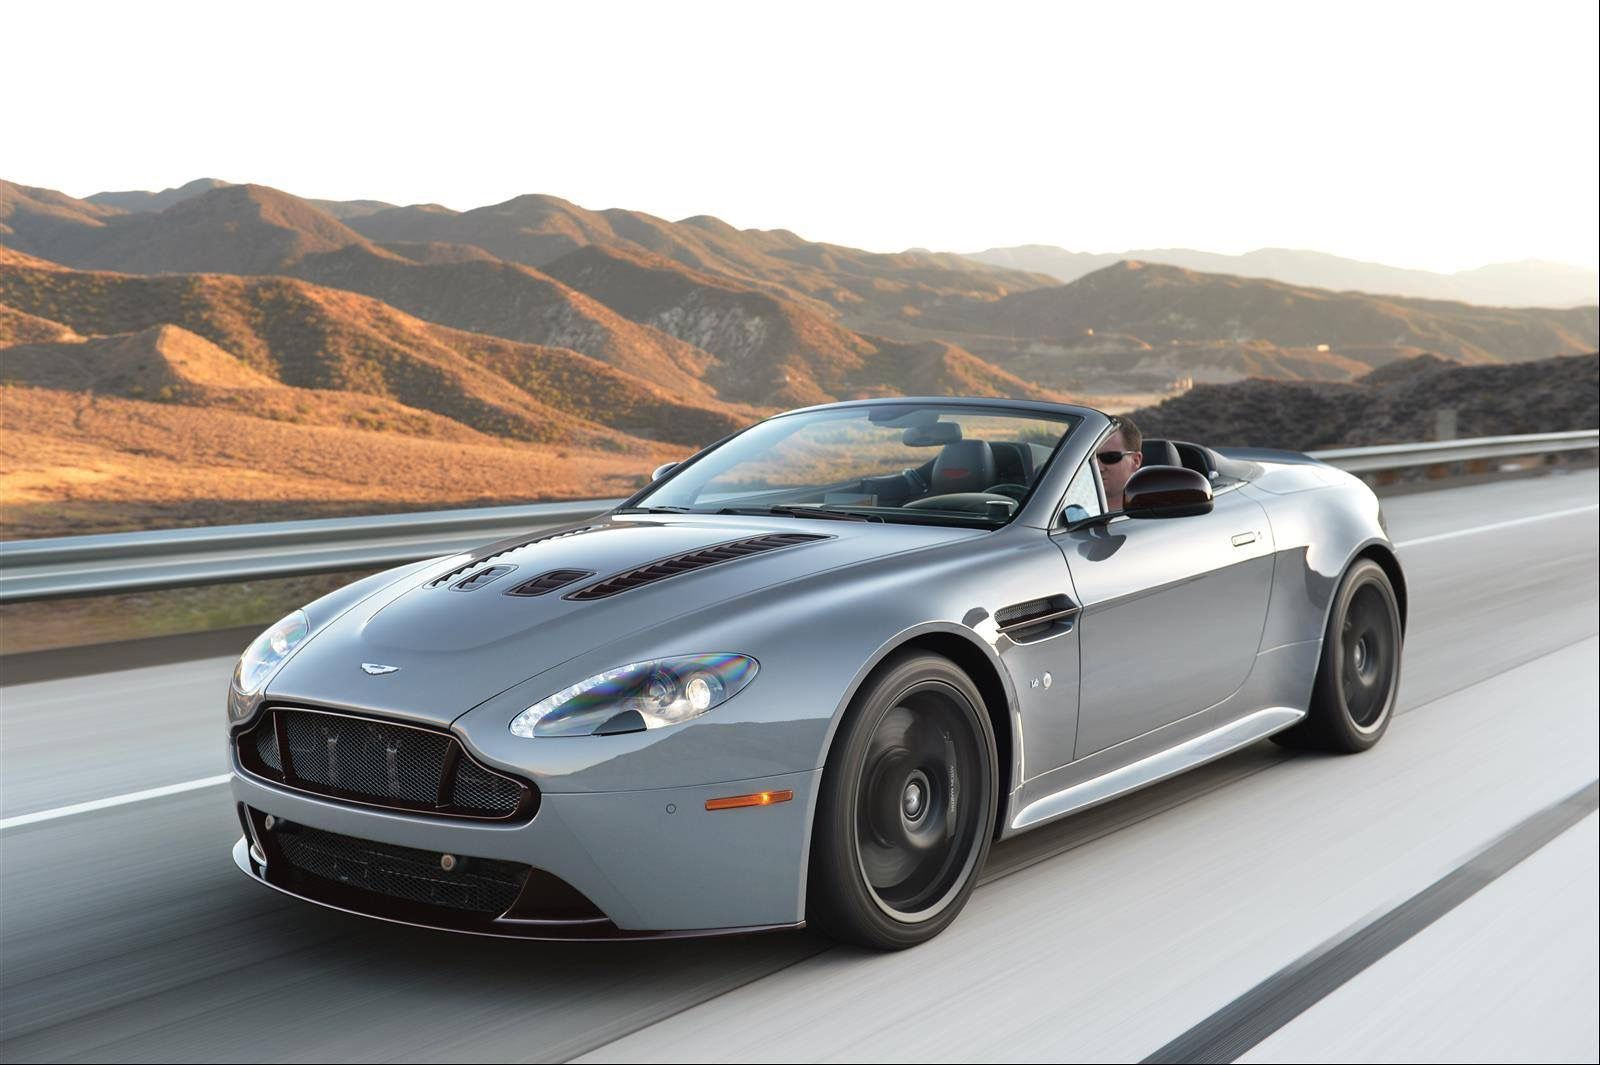 Aston Martin V12 Vantage Roadster Aston Martin Vantage Aston Martin V12 Aston Martin V12 Vantage